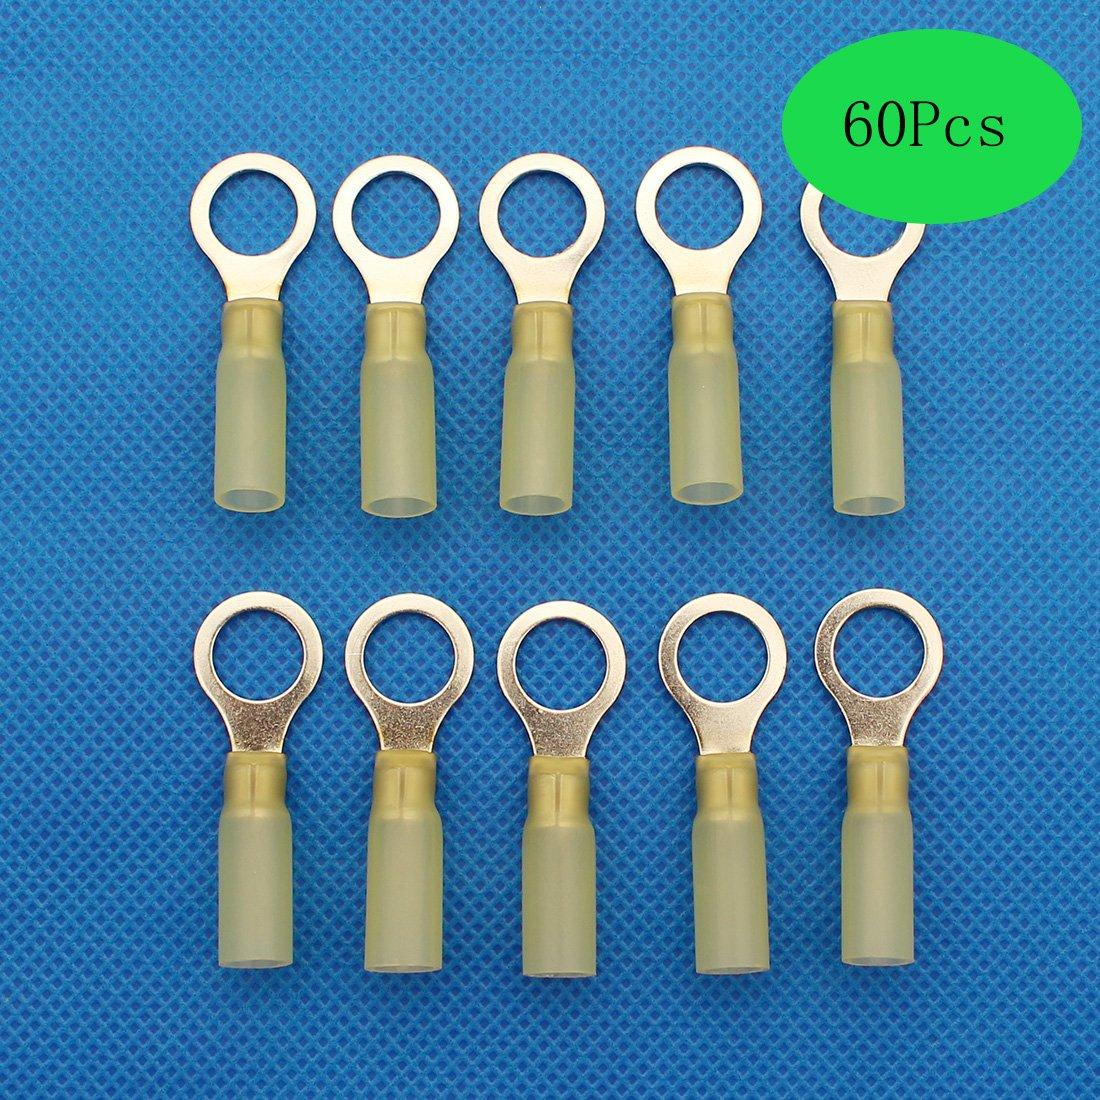 60Pcs Heat Shrink Connectors,Raogoodcx 12-10 GA Nylon Insulated Heat Shrink Ring waterproof wire connectors Marine Automotive Terminals Kit M10